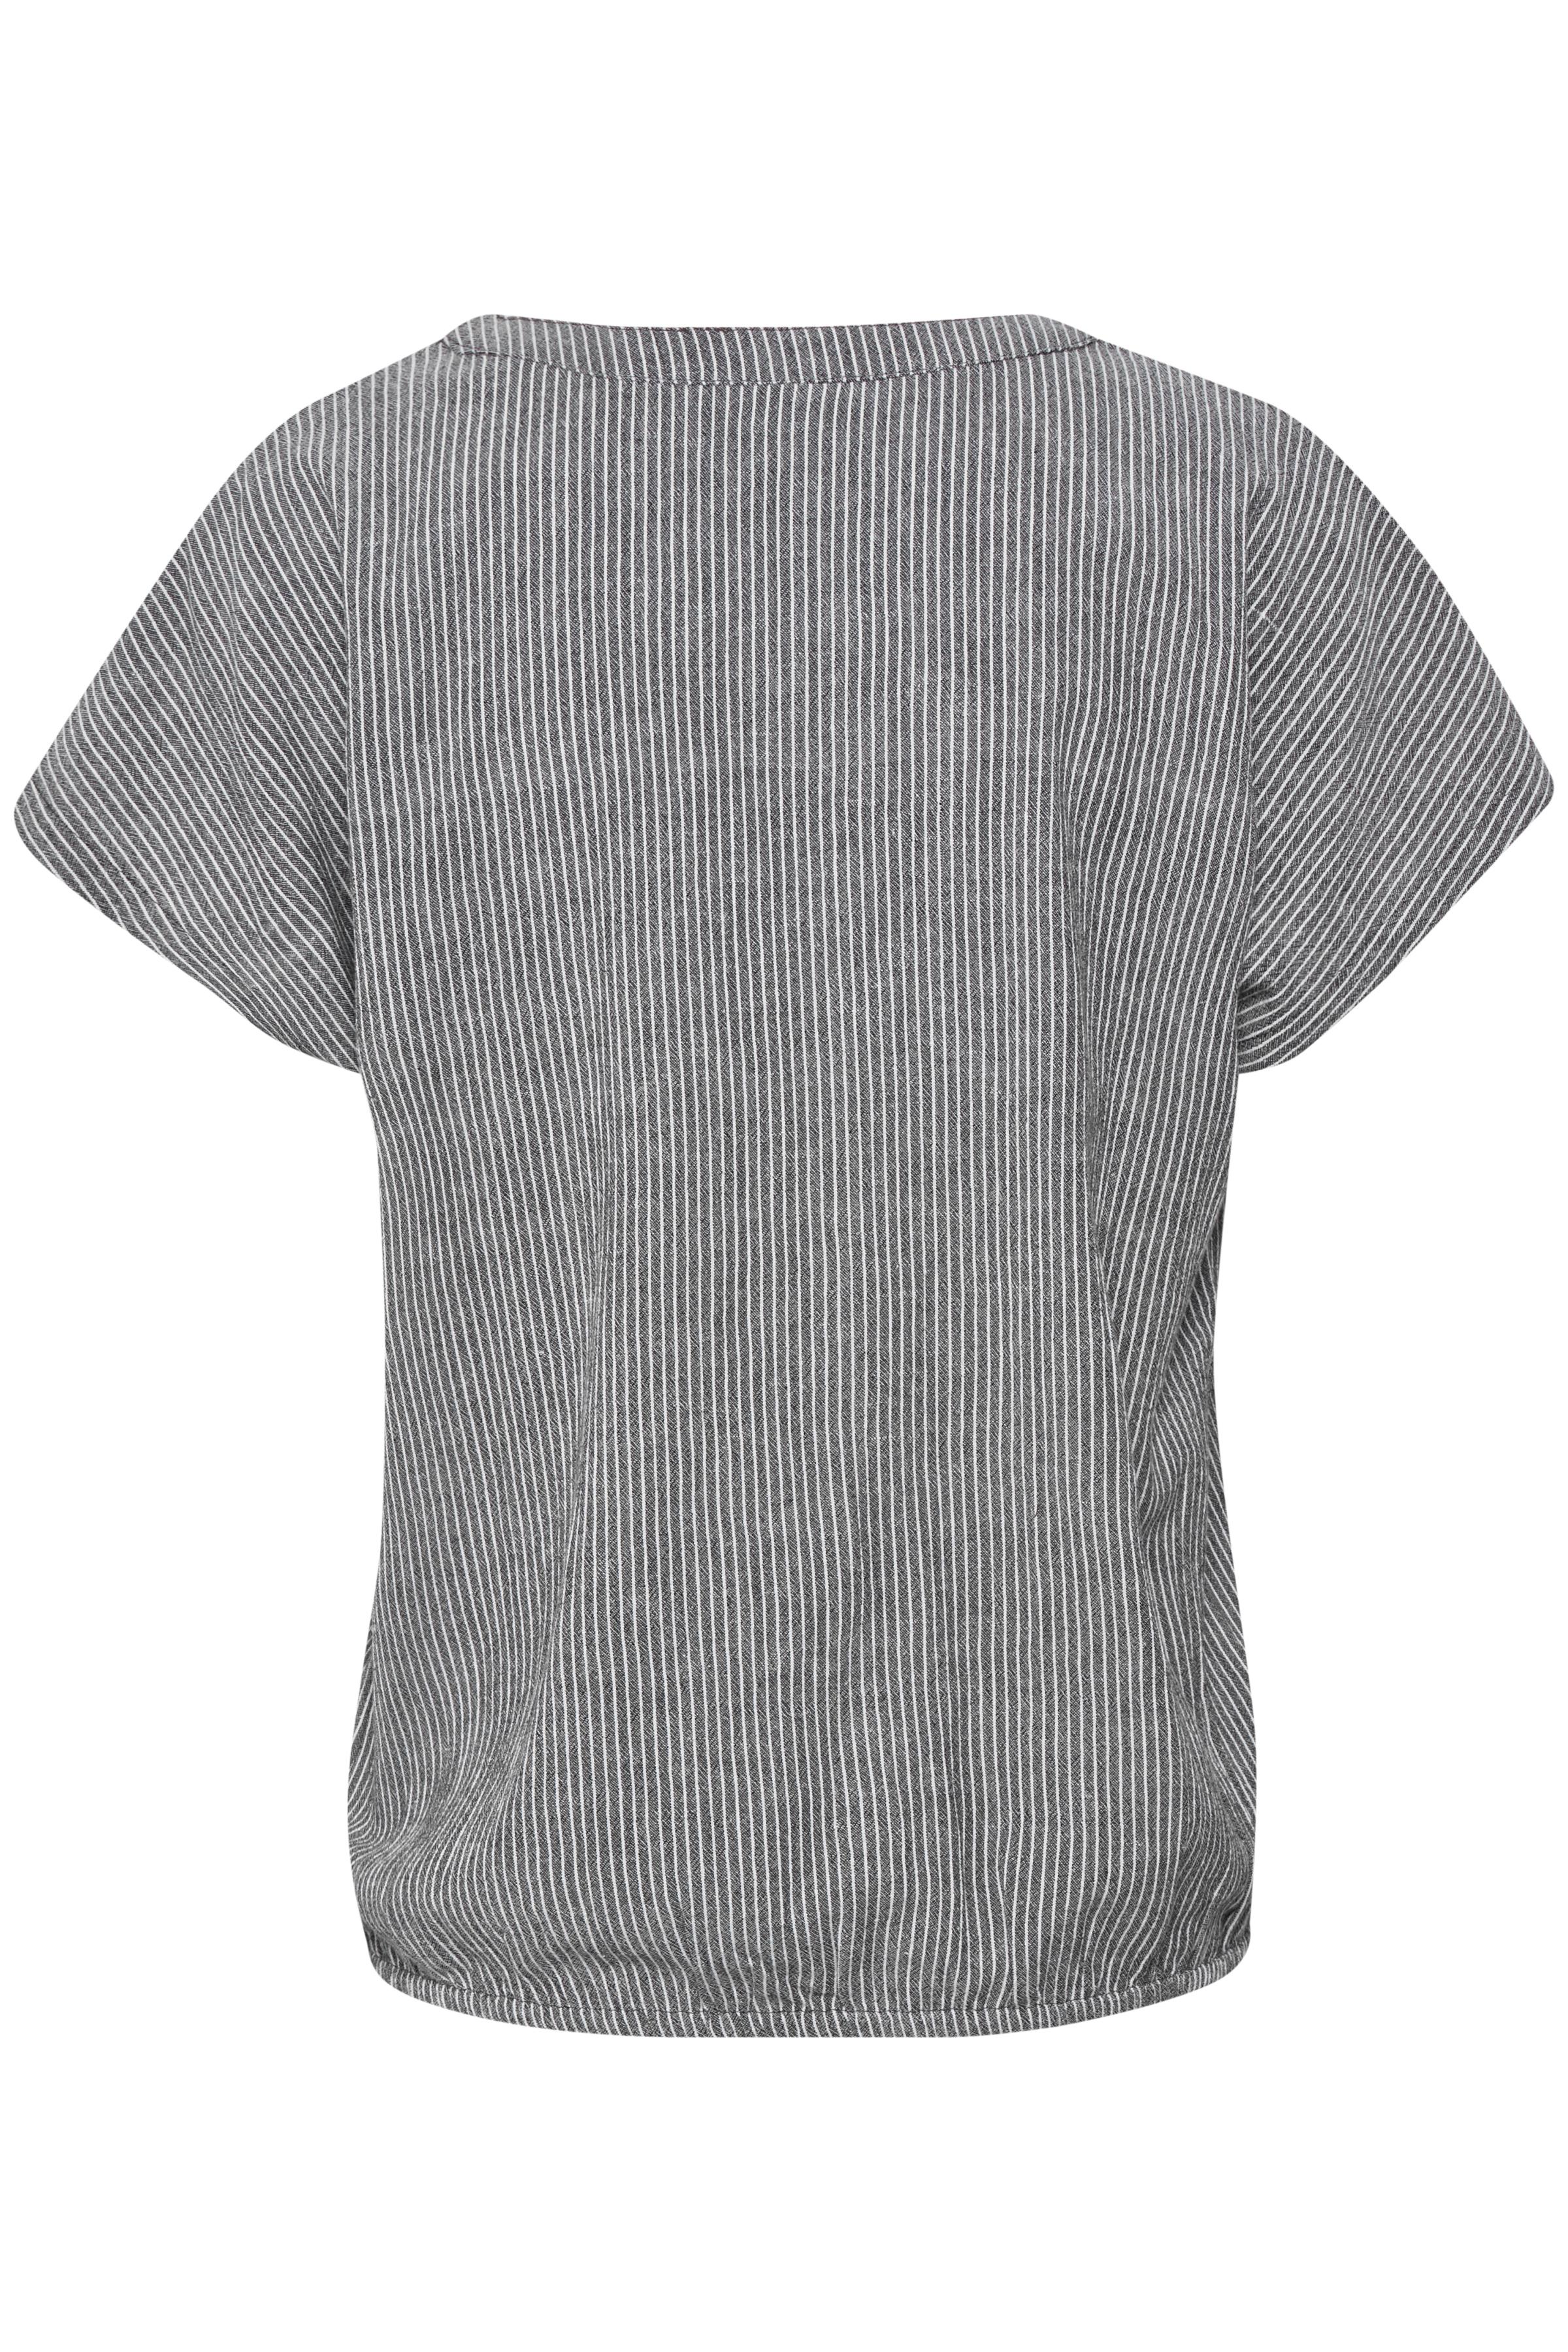 Marineblau/wollweiss Kurzarm-Bluse von Kaffe – Shoppen SieMarineblau/wollweiss Kurzarm-Bluse ab Gr. 34-46 hier